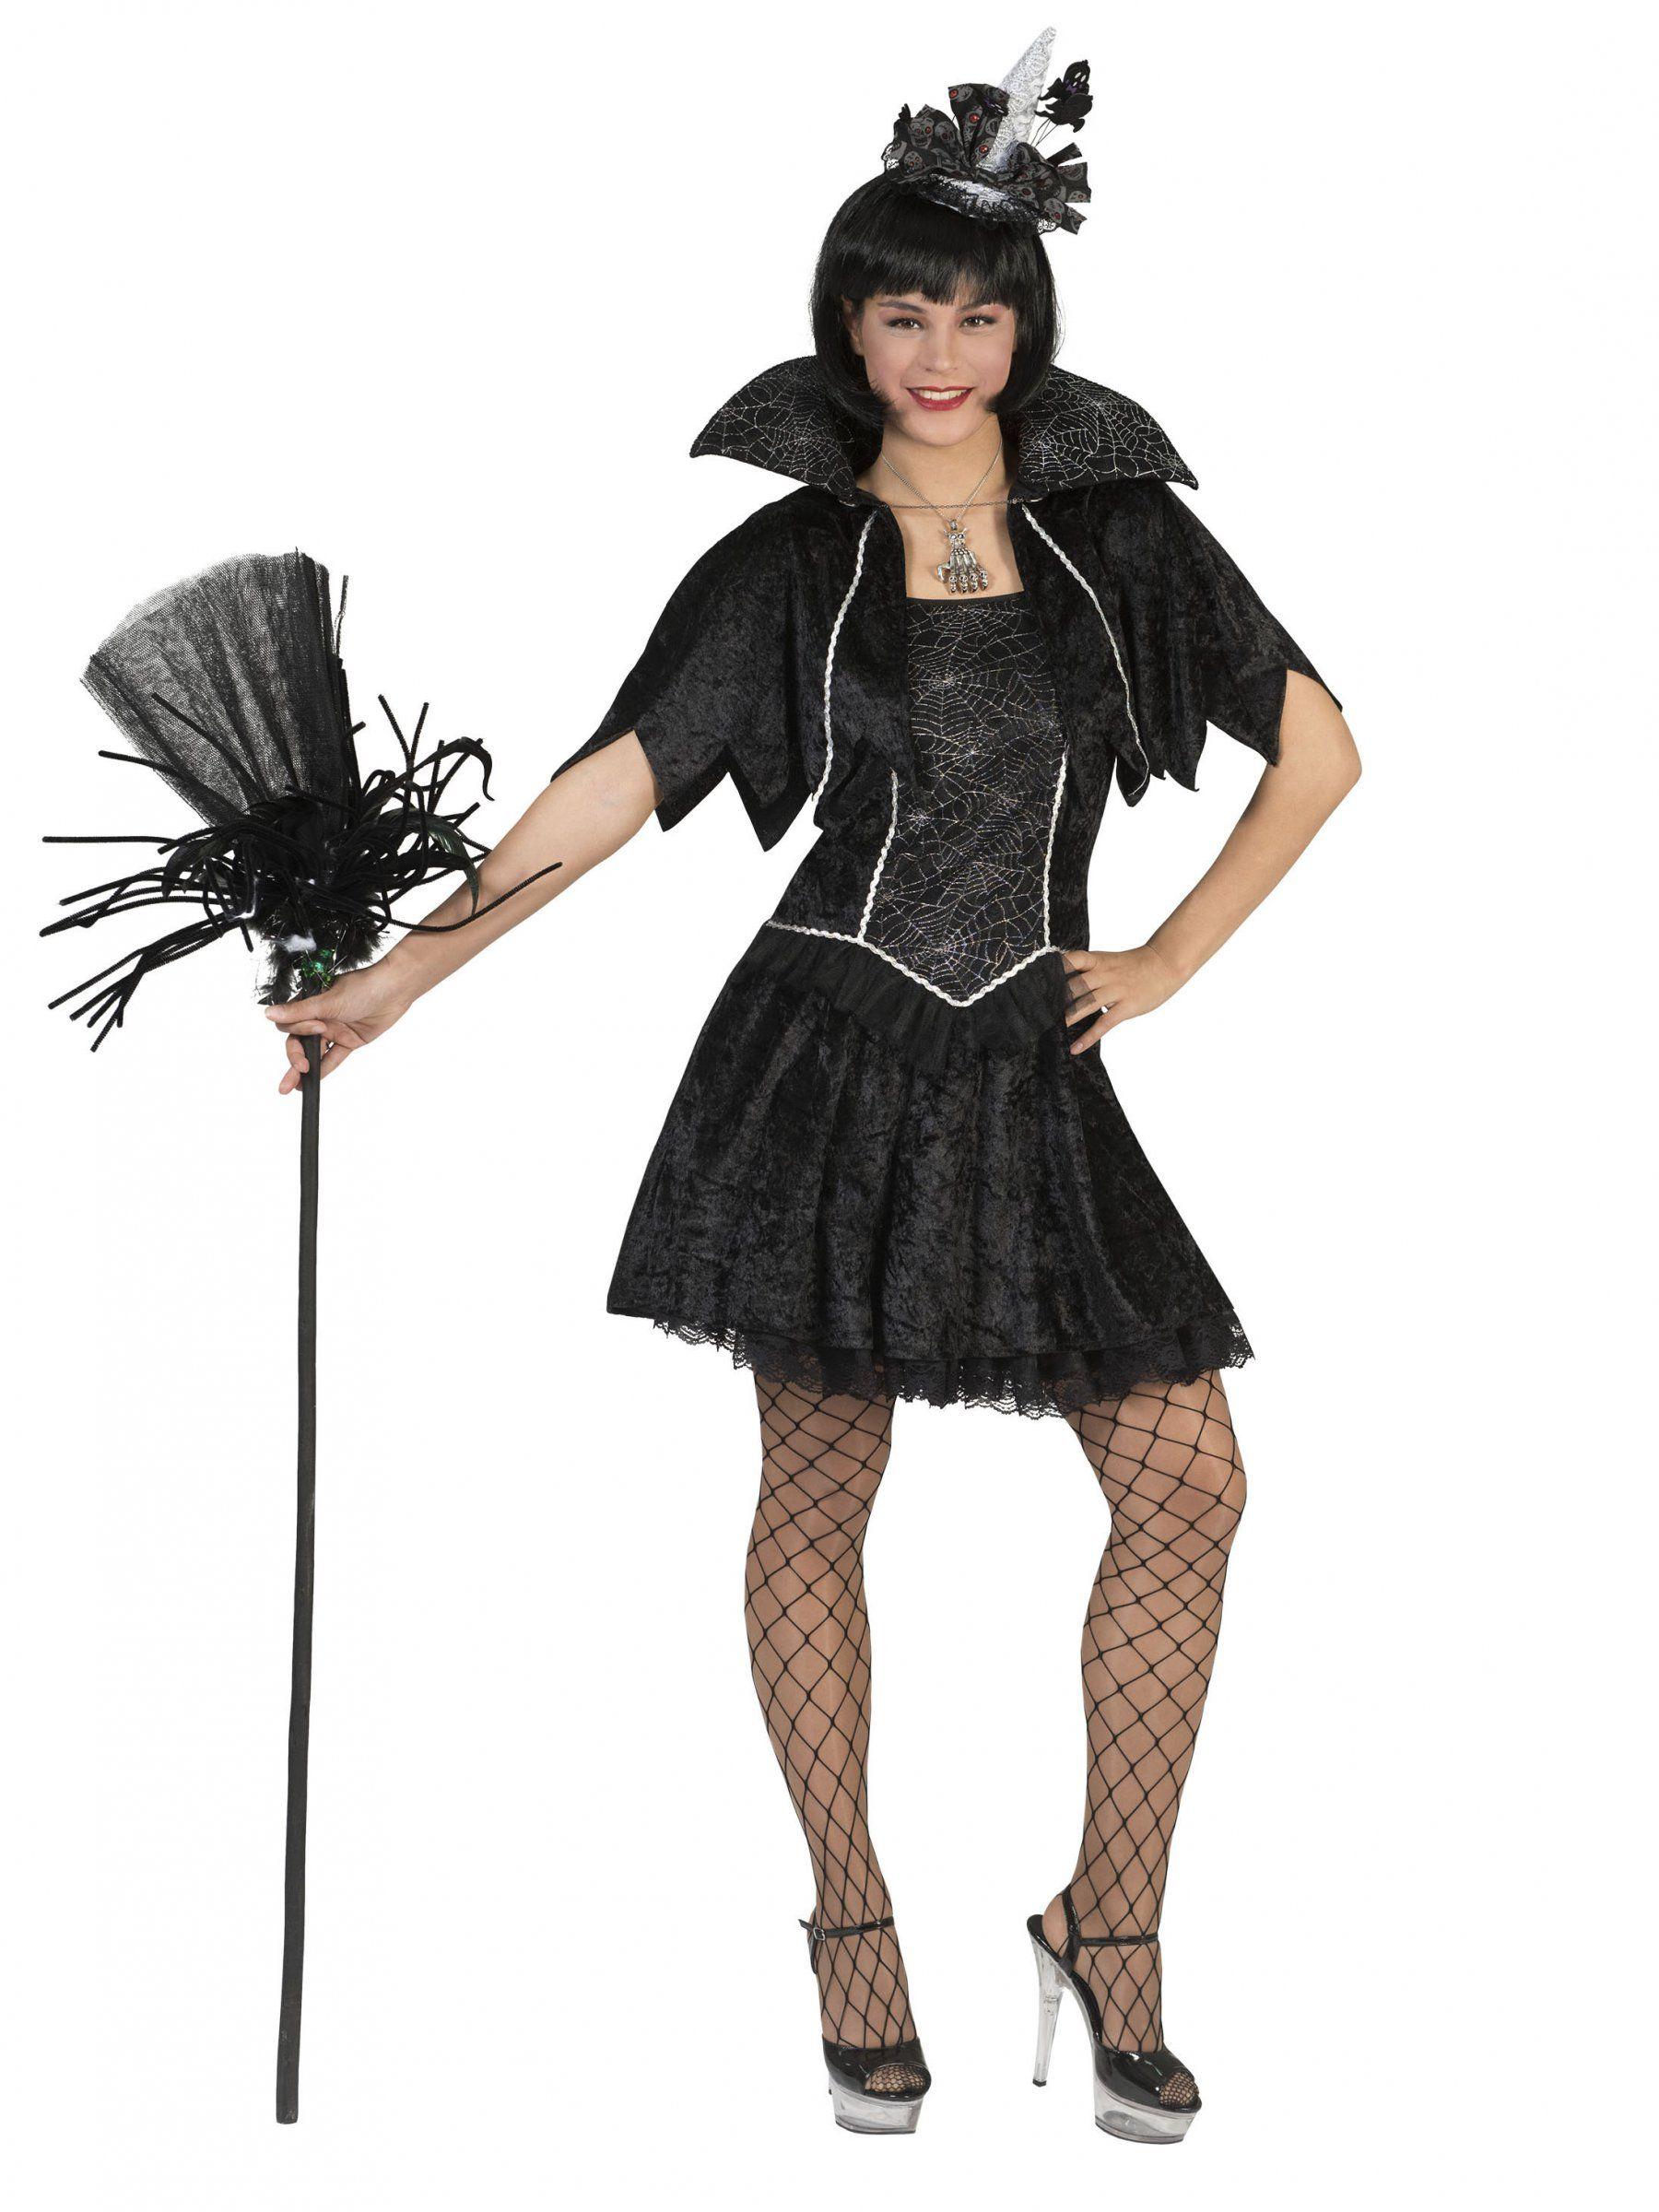 Disfraz bruja araña negra mujer Halloween Este disfraz de